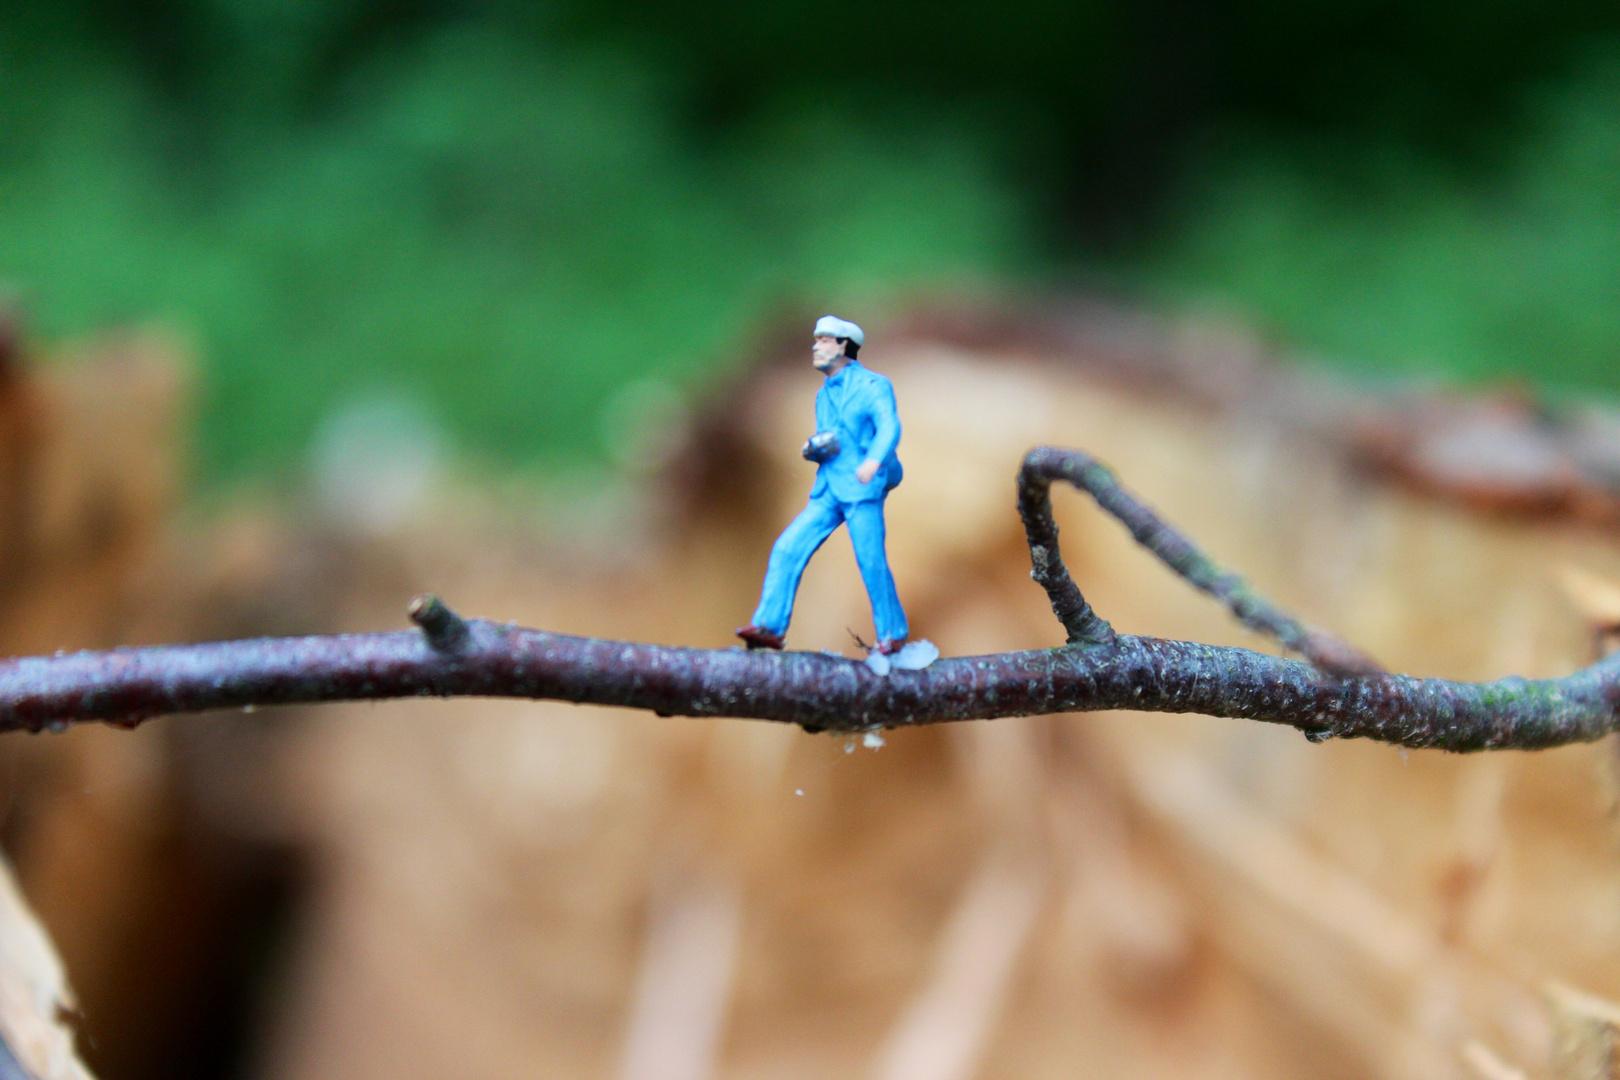 The.walking.blue.